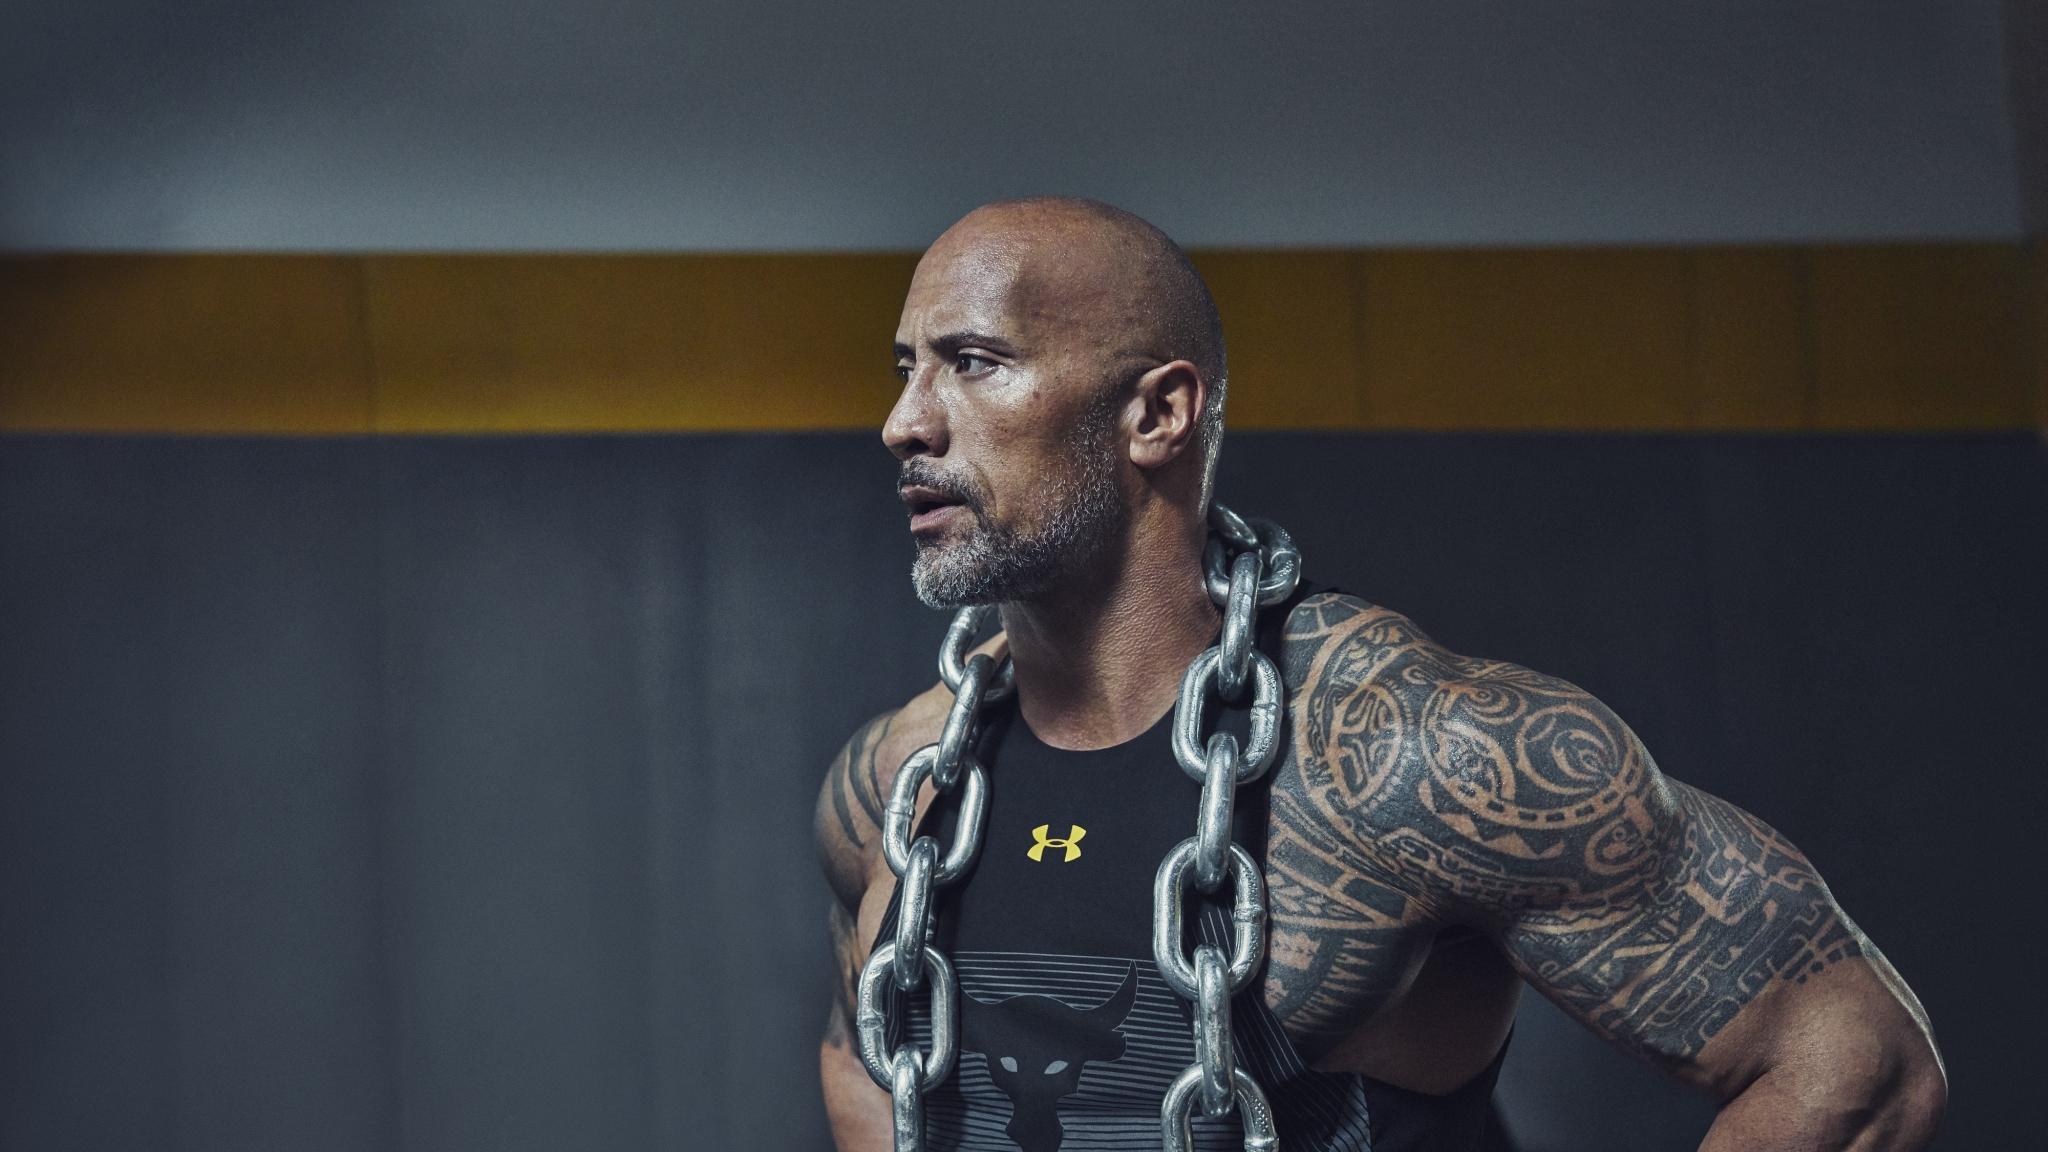 2048x1152 Dwayne Johnson Tattoos 2048x1152 Resolution